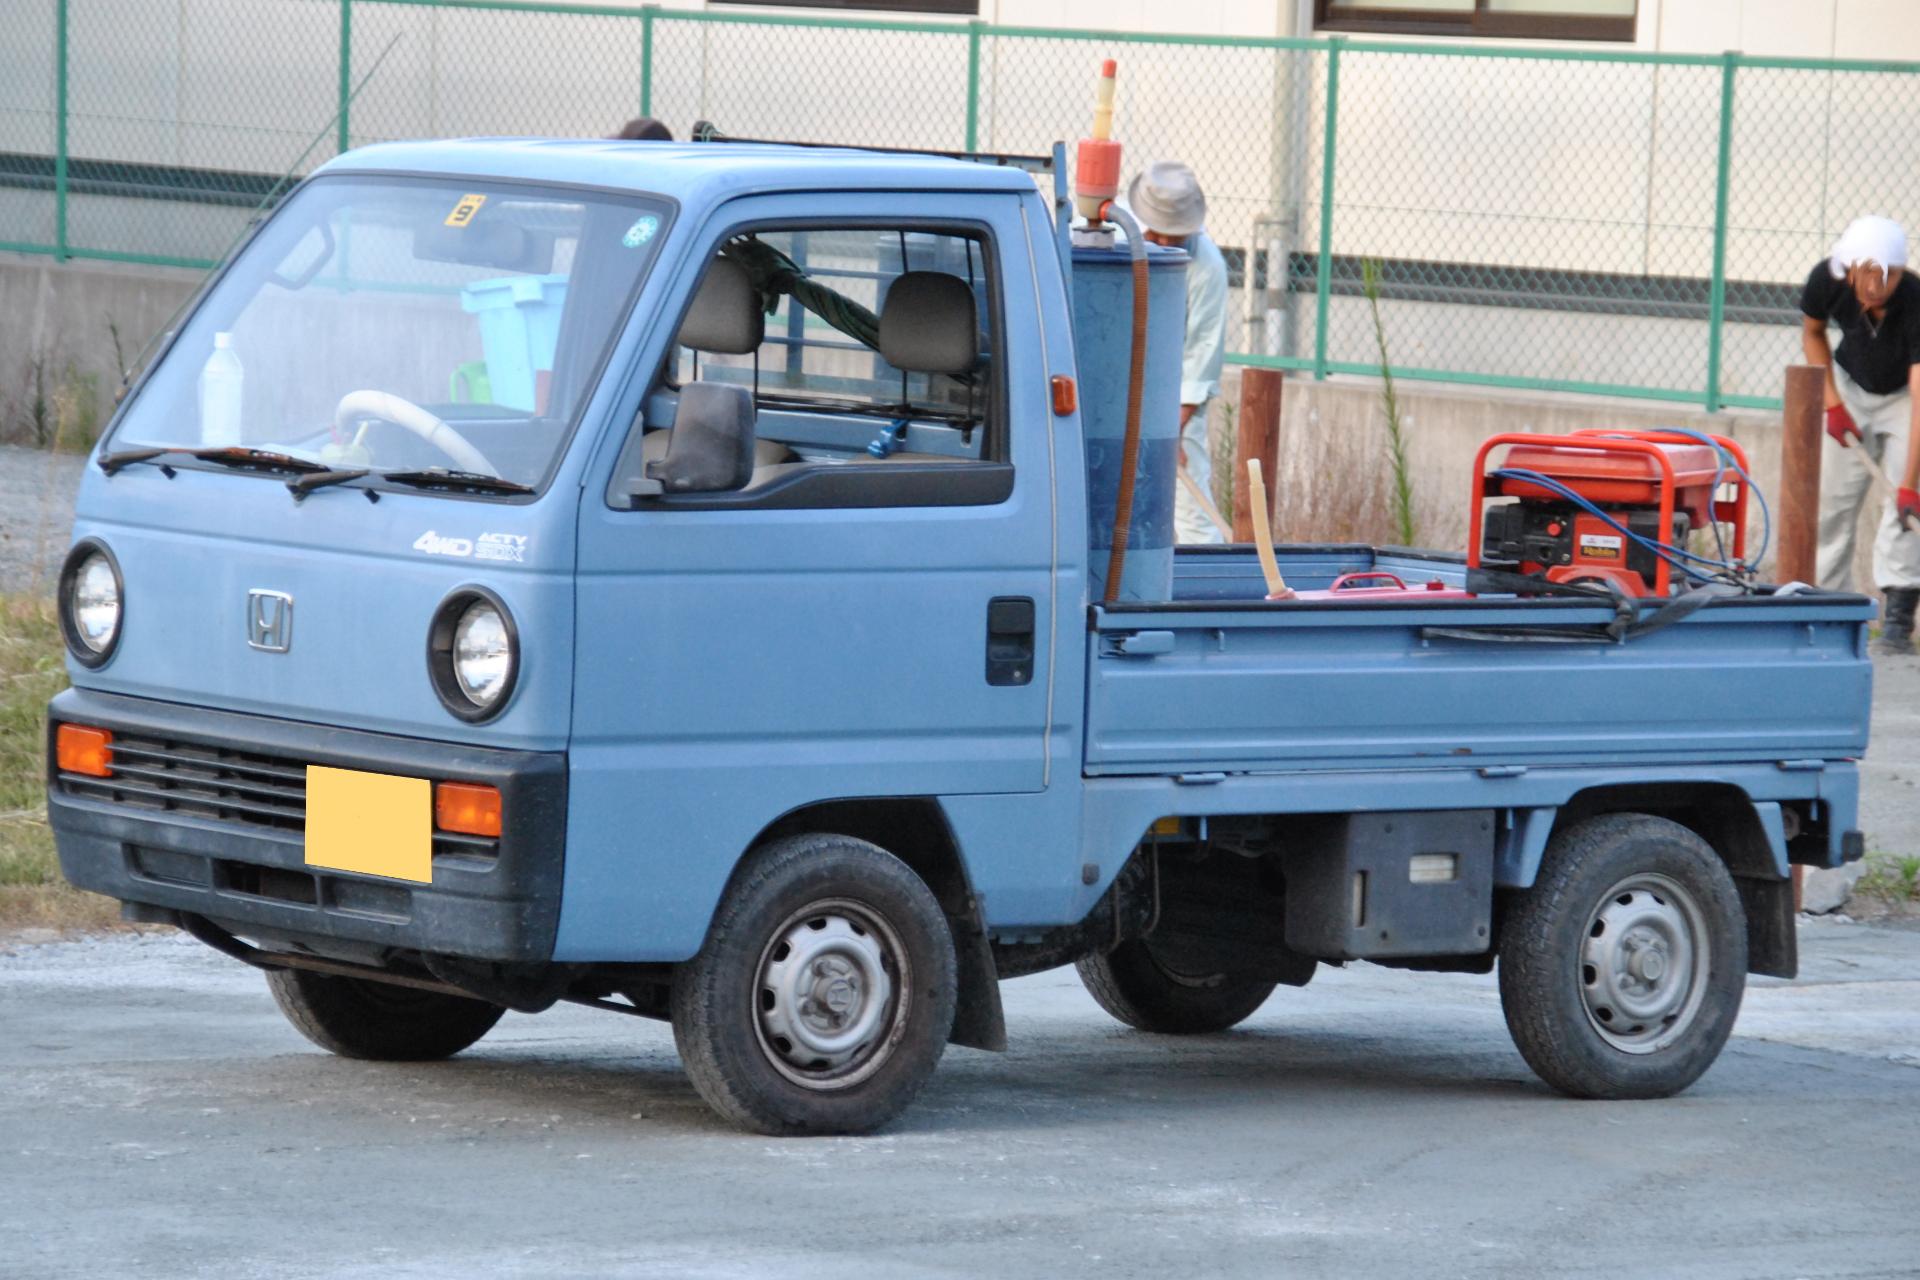 File:2nd Honda Acty.JPG